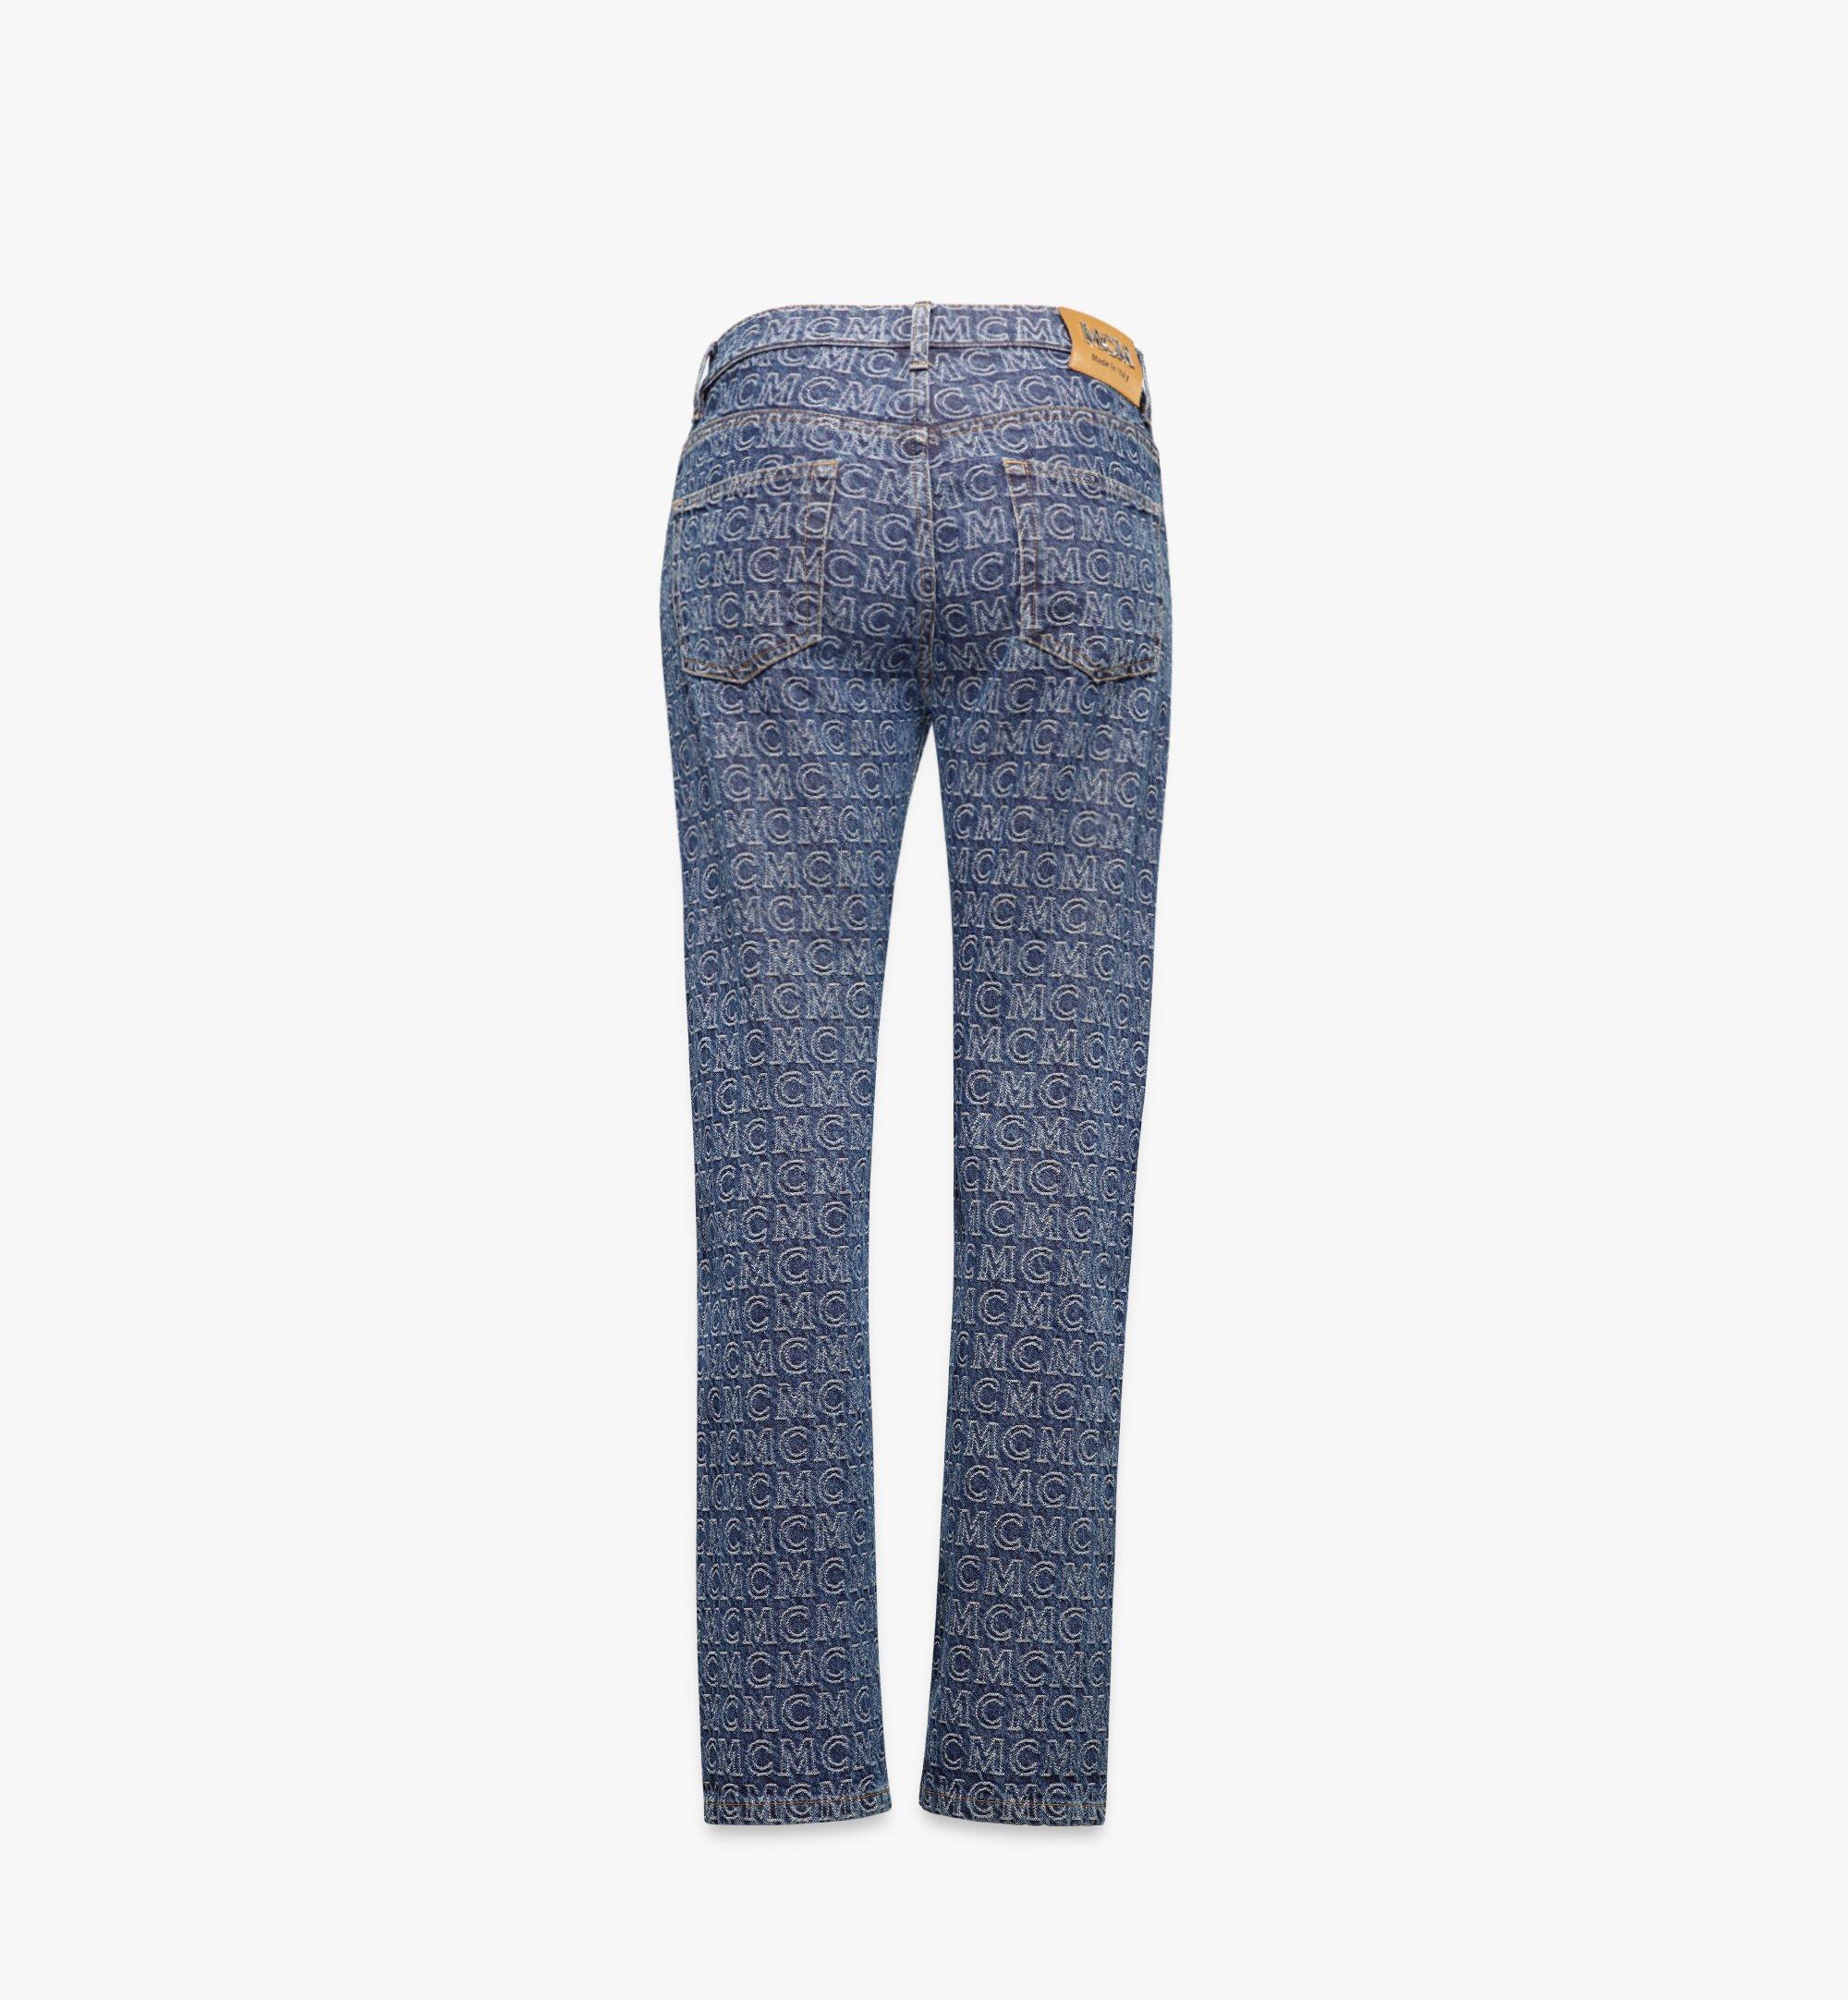 MCM 女士印花直筒牛仔褲 Blue MFPAADS01VW038 更多視圖 1